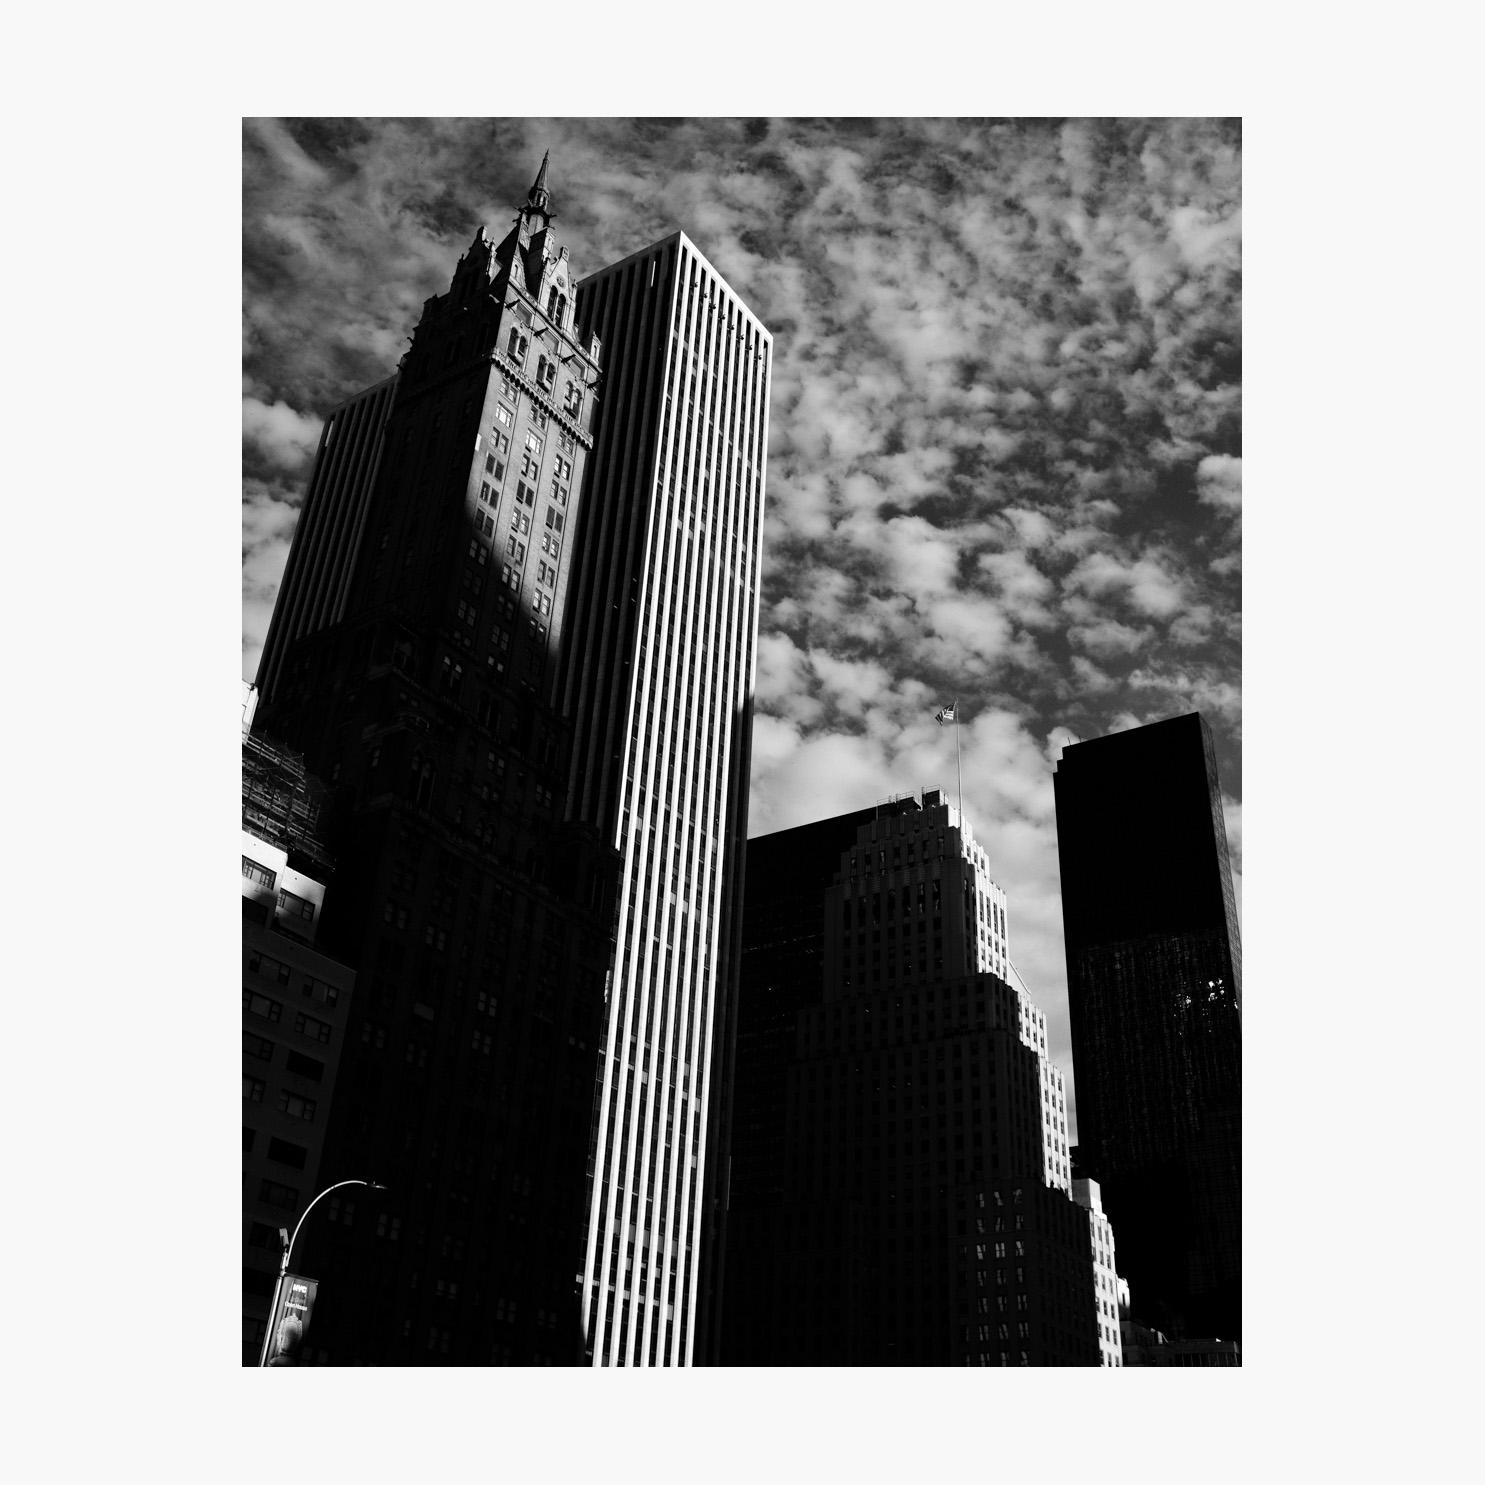 ©-Harry-W-Edmonds-2018-@photographersnote-Street-Sights-Social-PN09.jpg